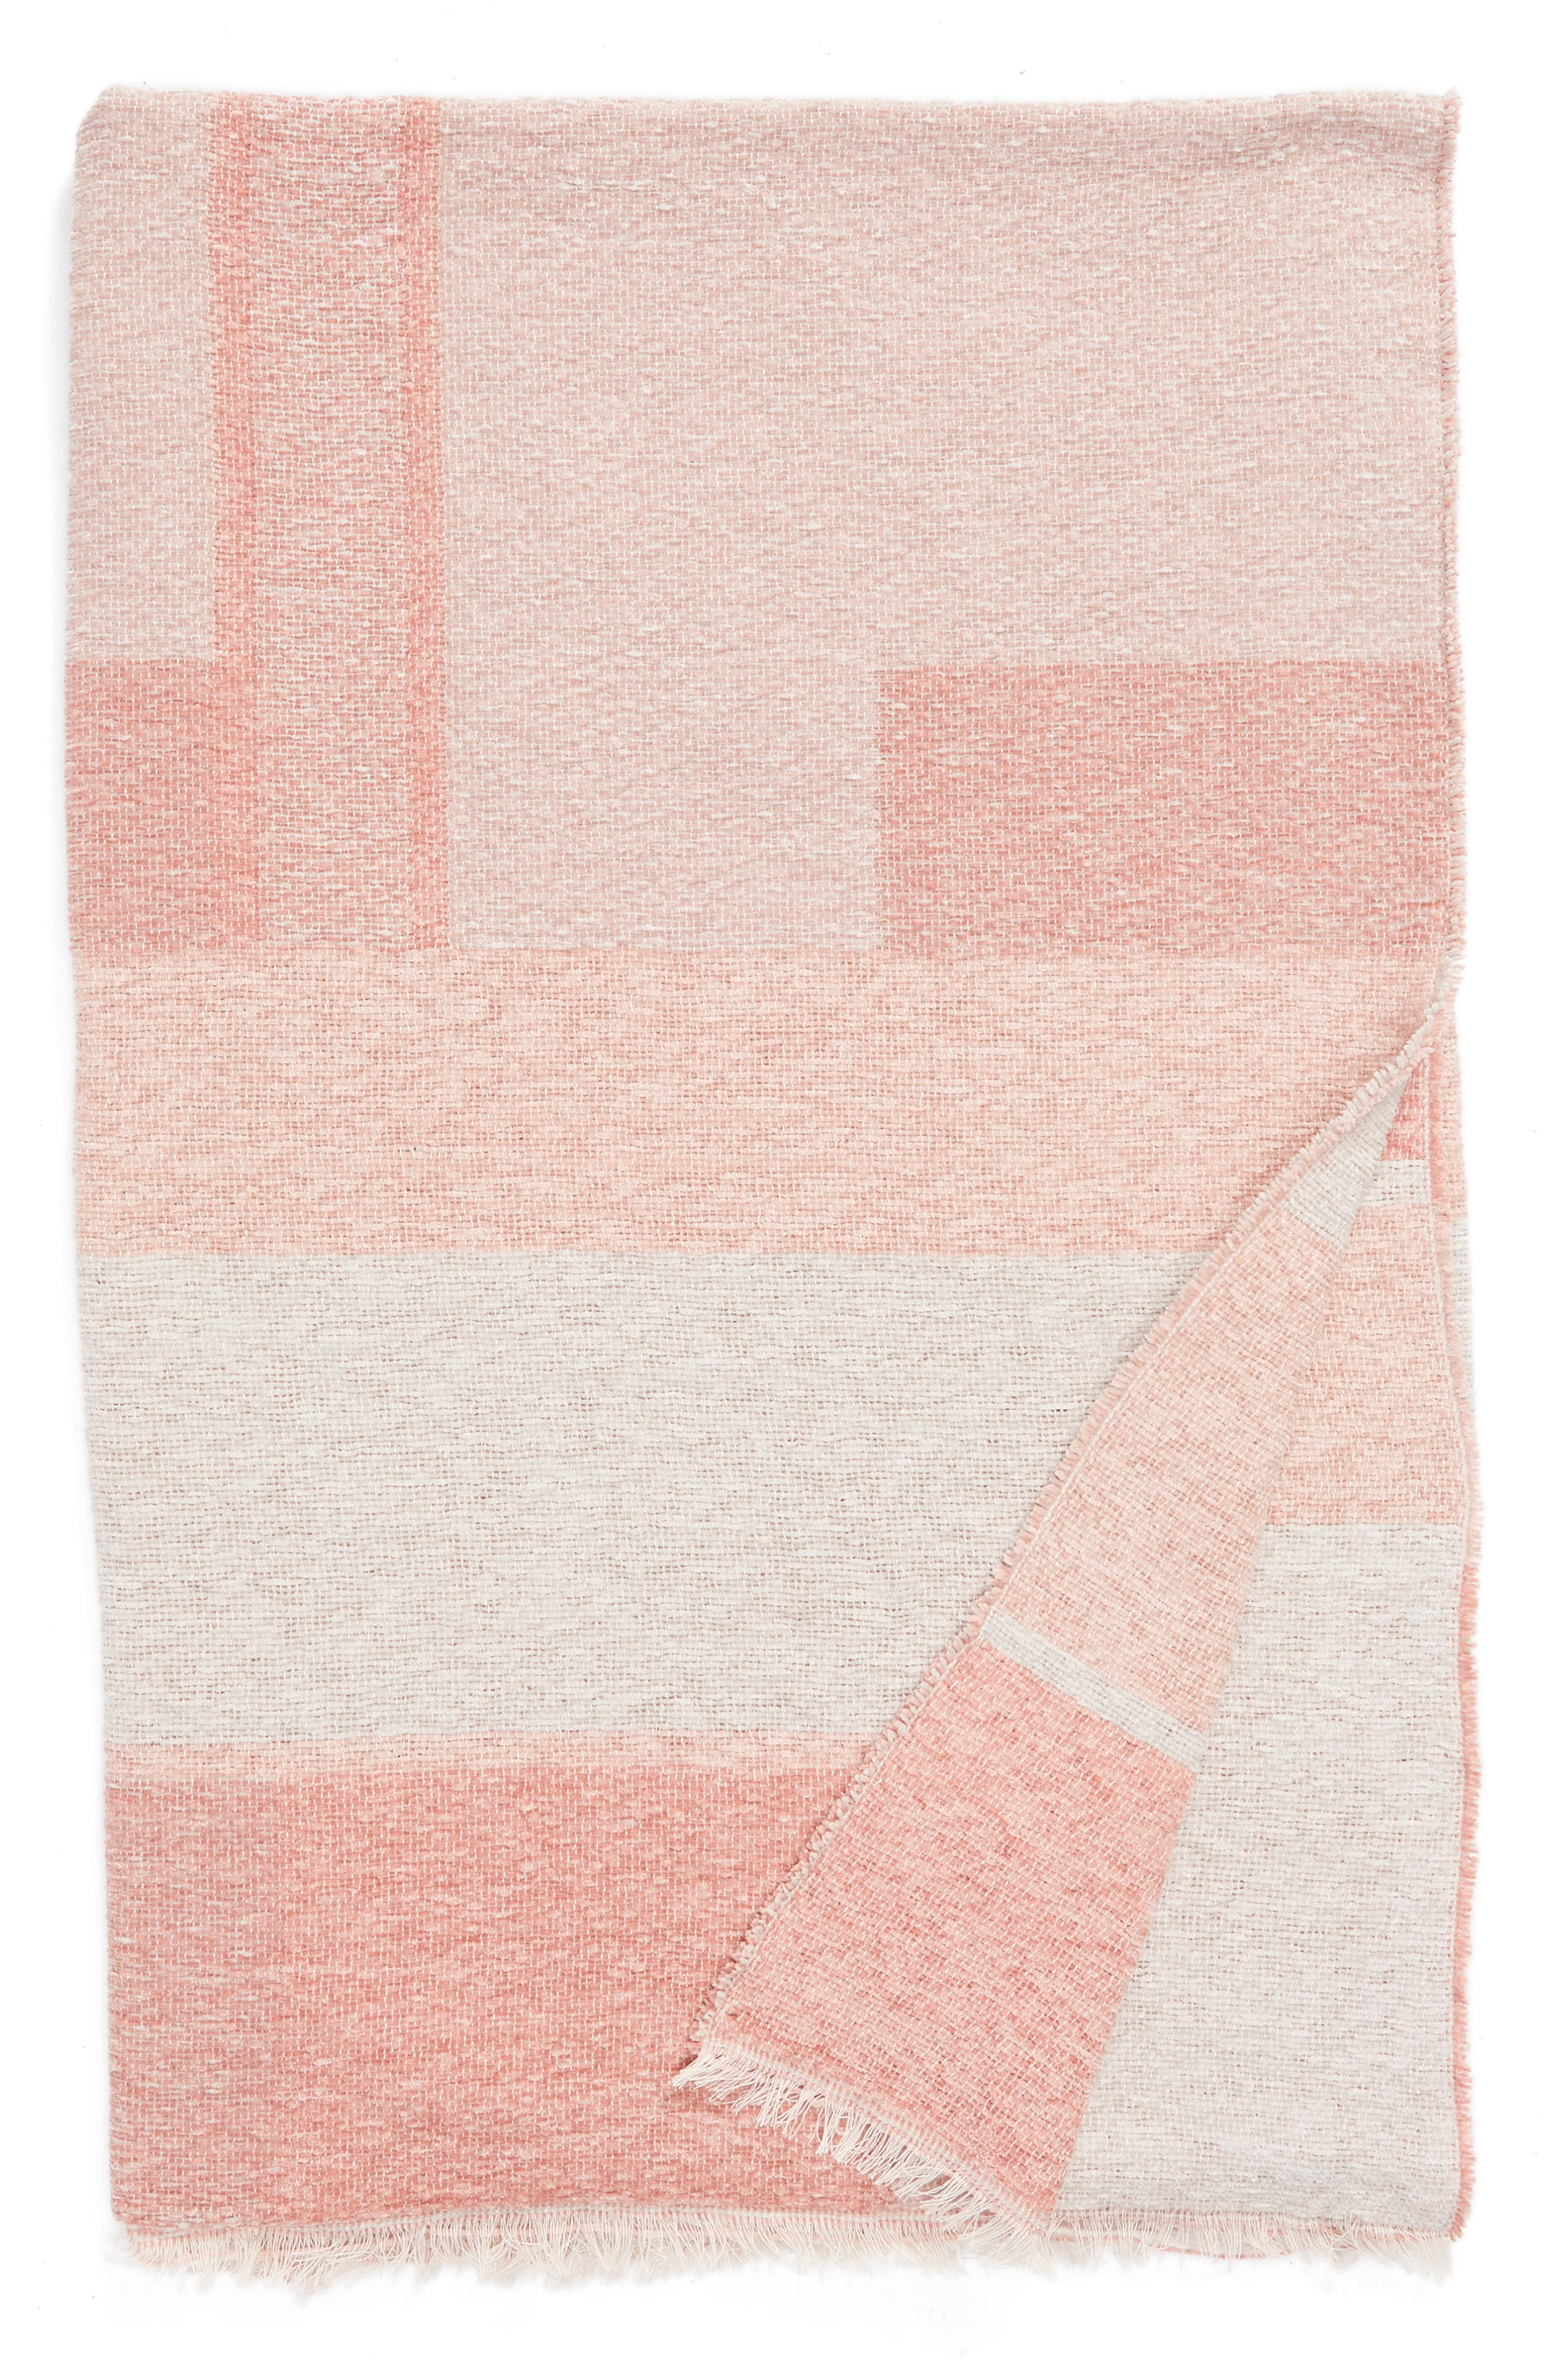 Geo Throw Blanket,                         Main,                         color, PINK MISTY MULTI